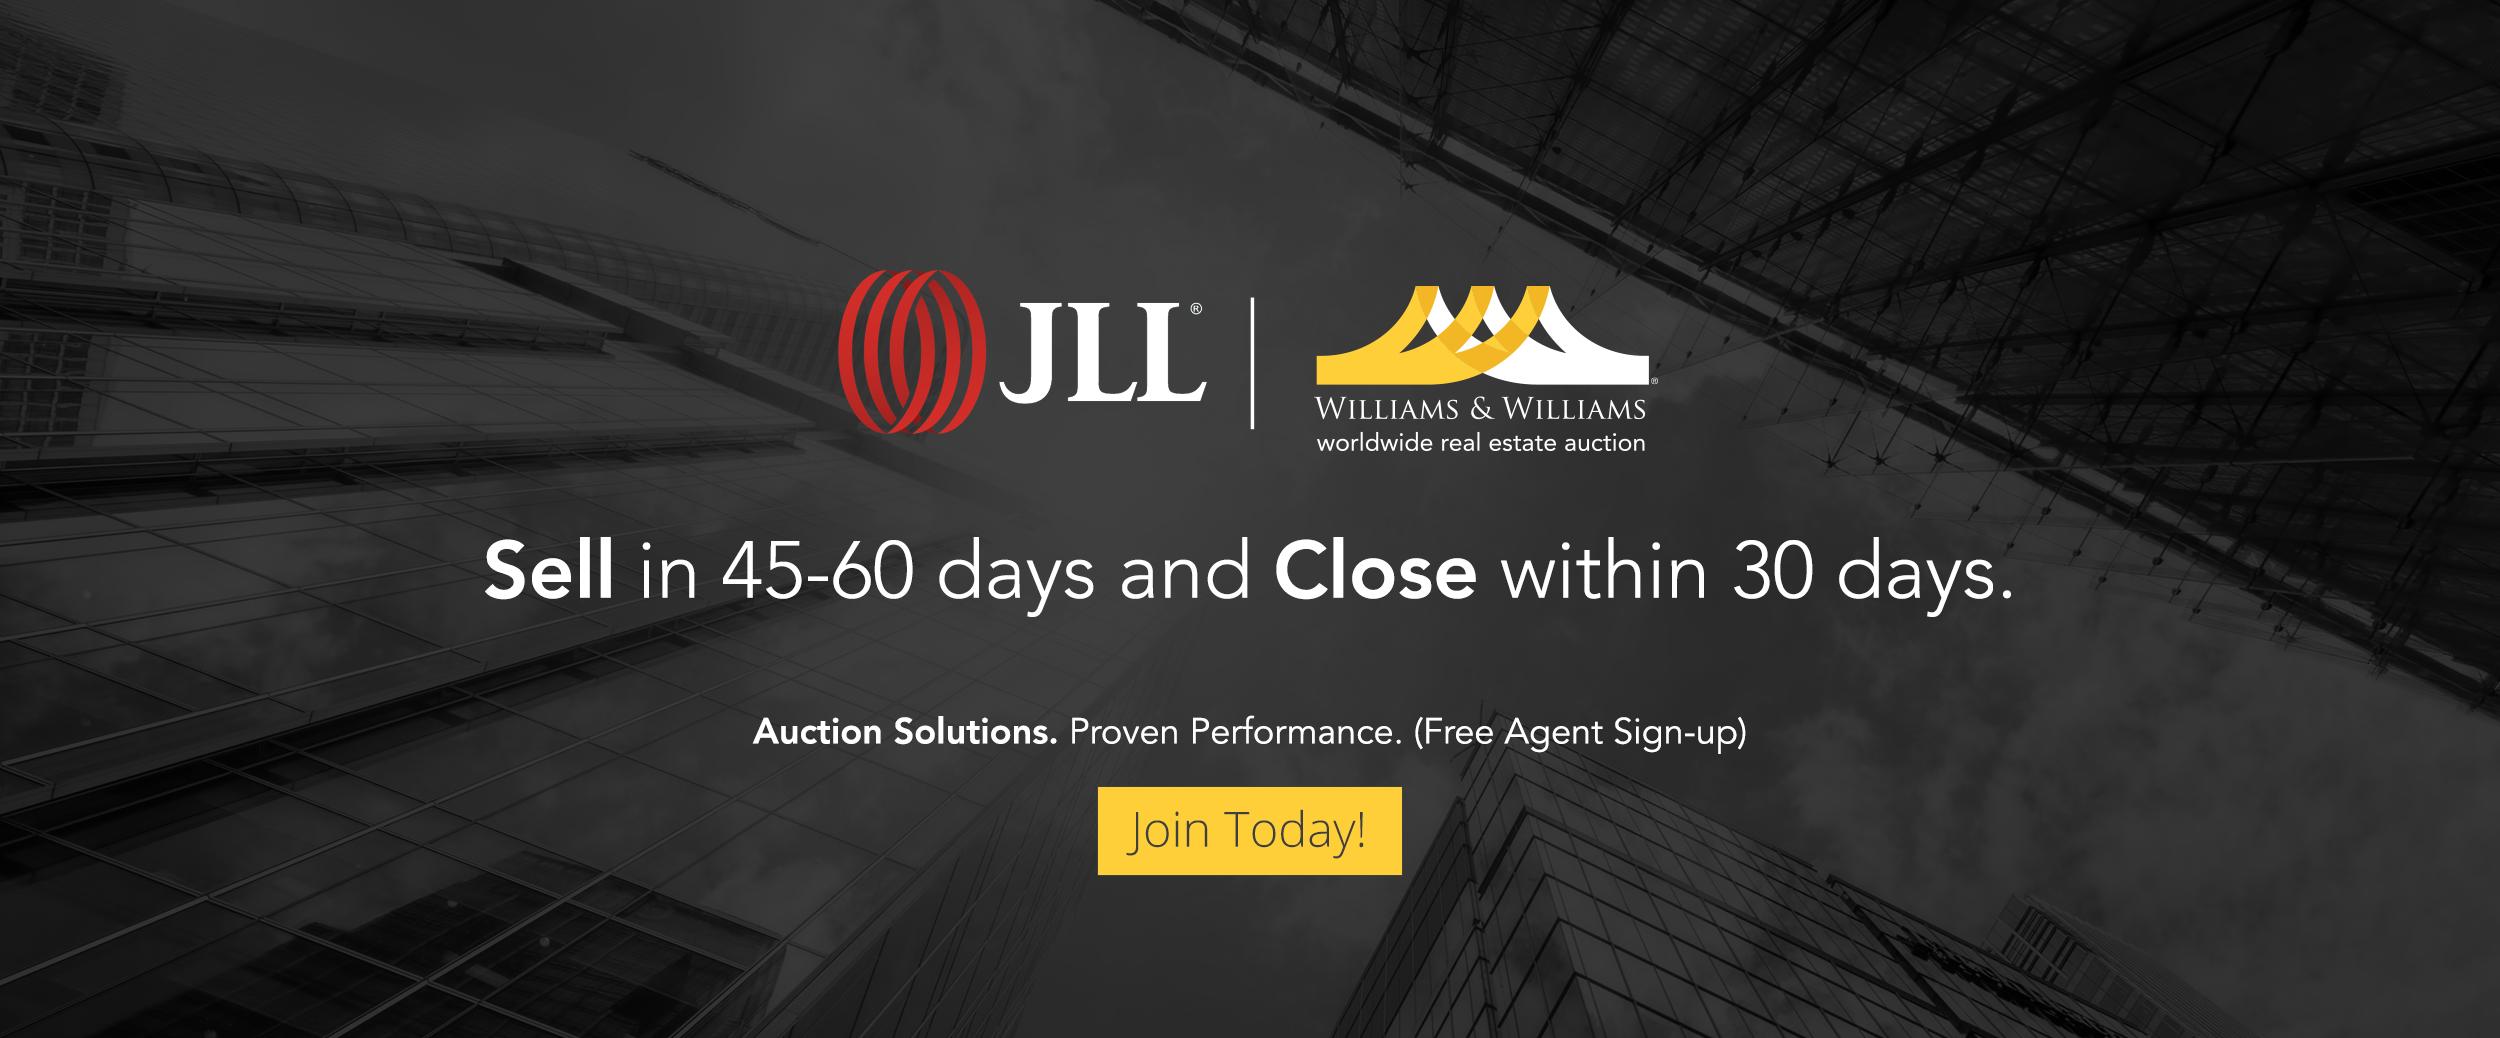 Williams & Williams Real Estate Auctions